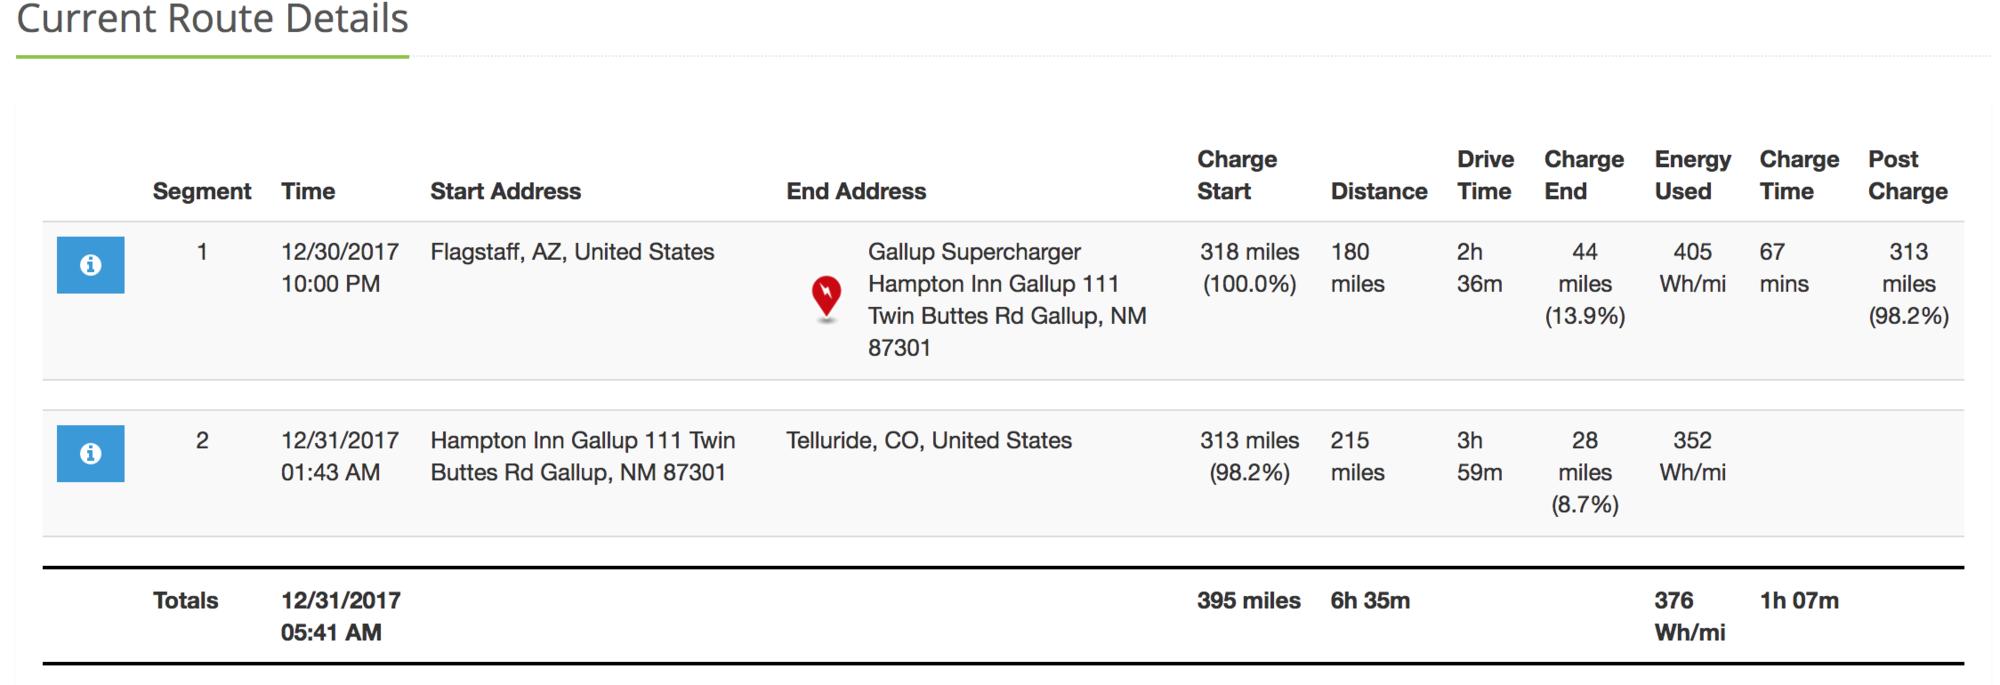 MS100D 1231 2200 Details Flag Gallup Telluride Spd0 Bat95 Cabin60.png